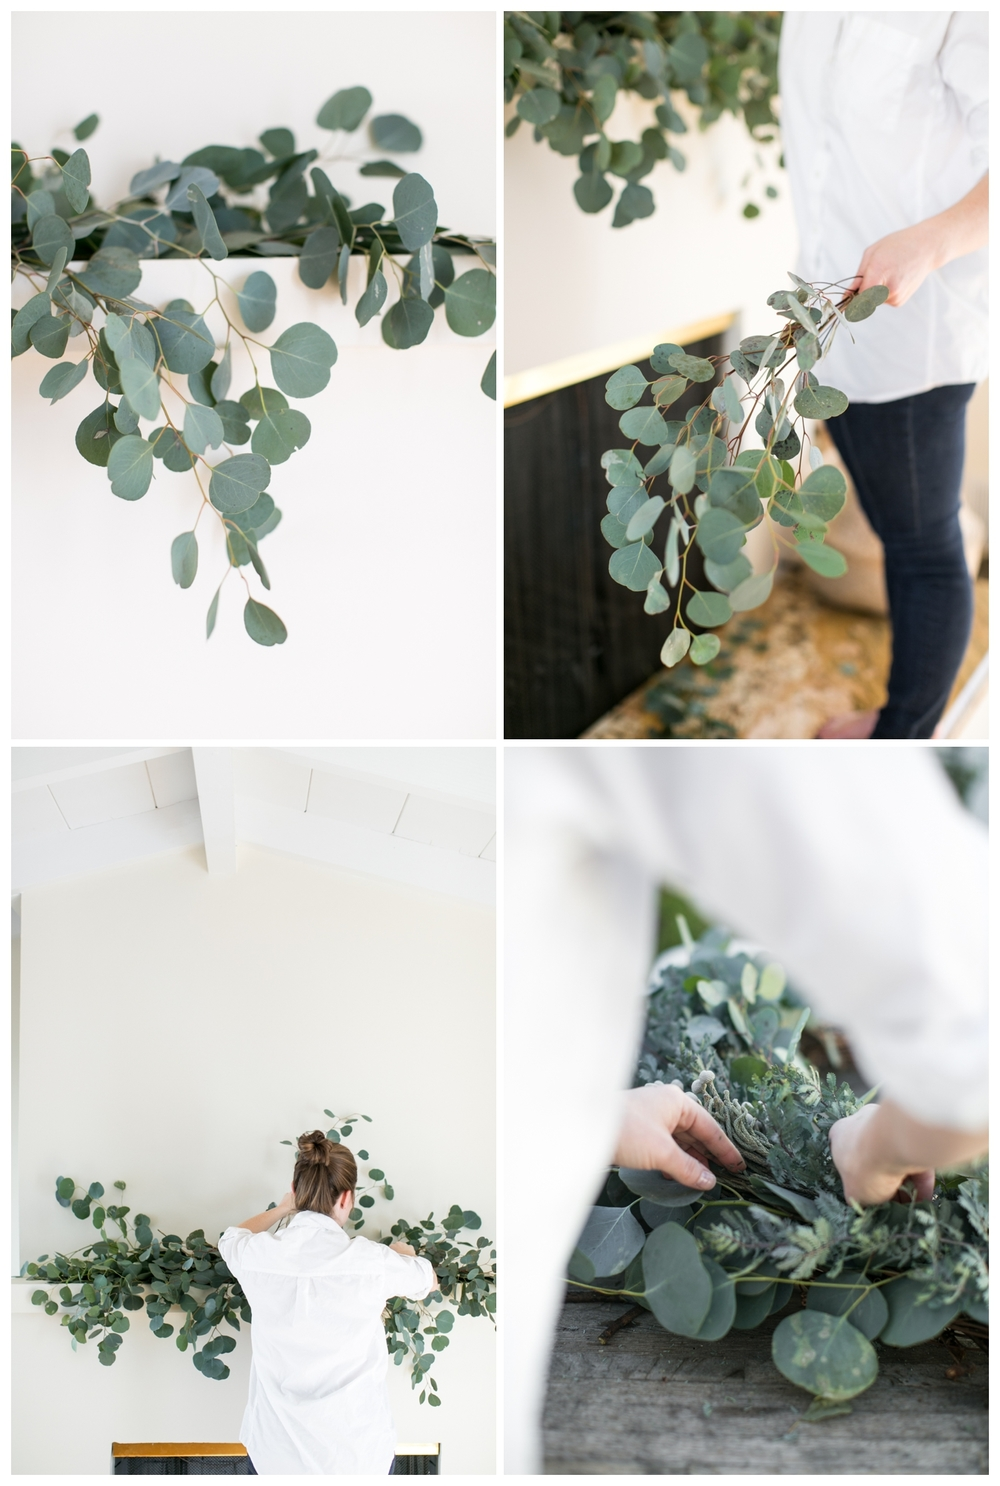 Hart+Honey_Eucalyptus_001.jpg